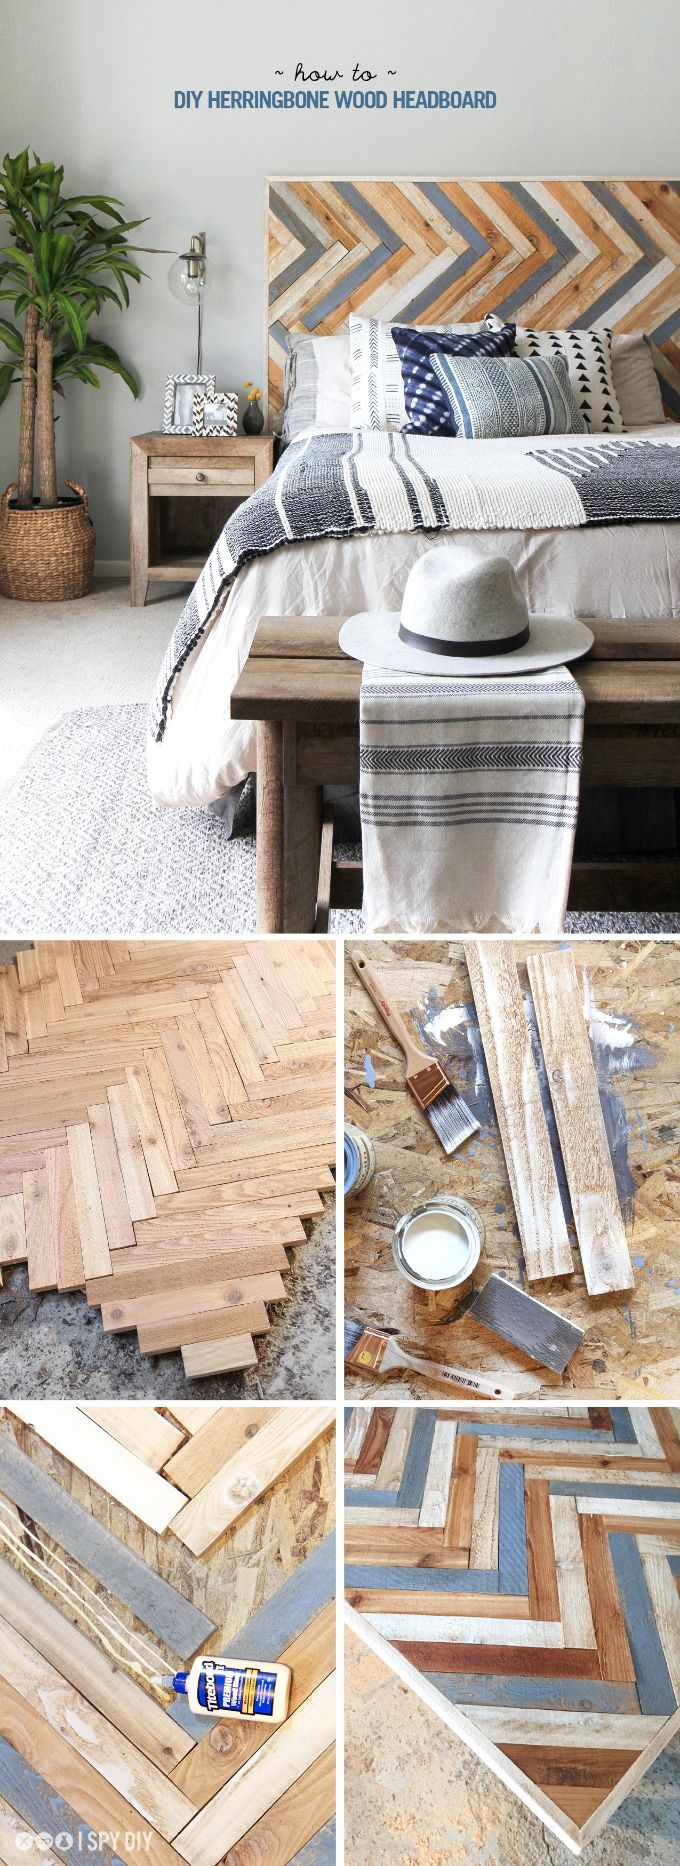 » MY DIY | Herringbone Wood Headboard